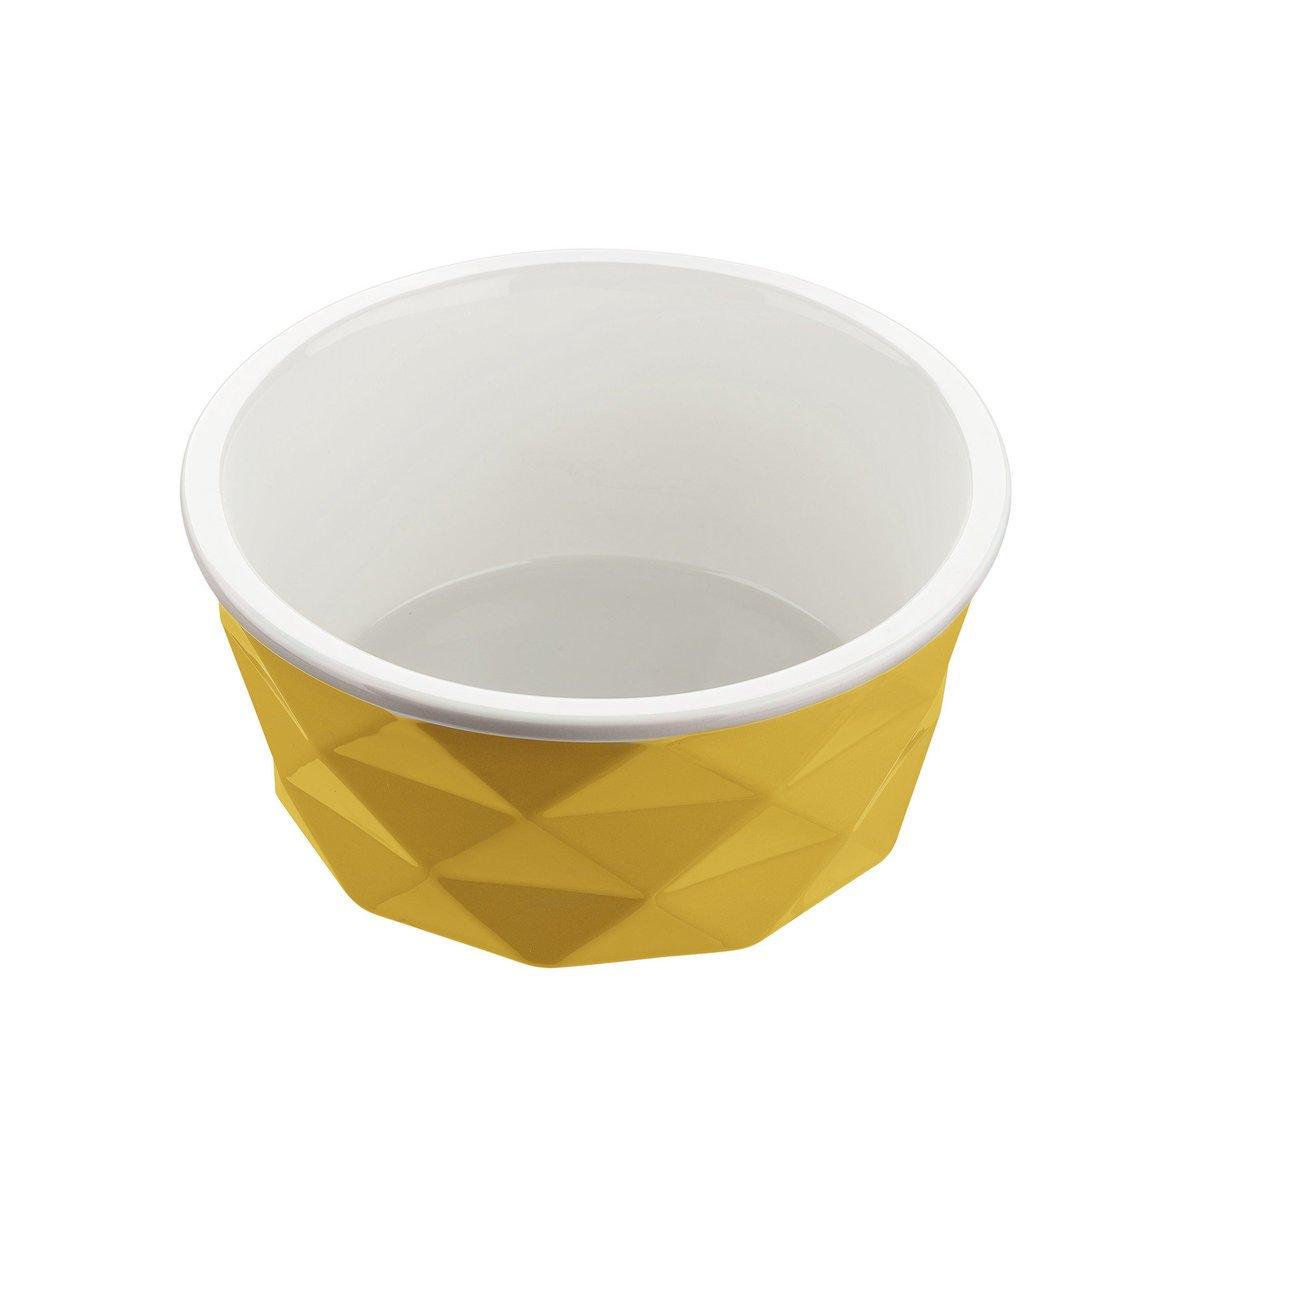 Hunter Keramik Napf Eiby 68648, Bild 11